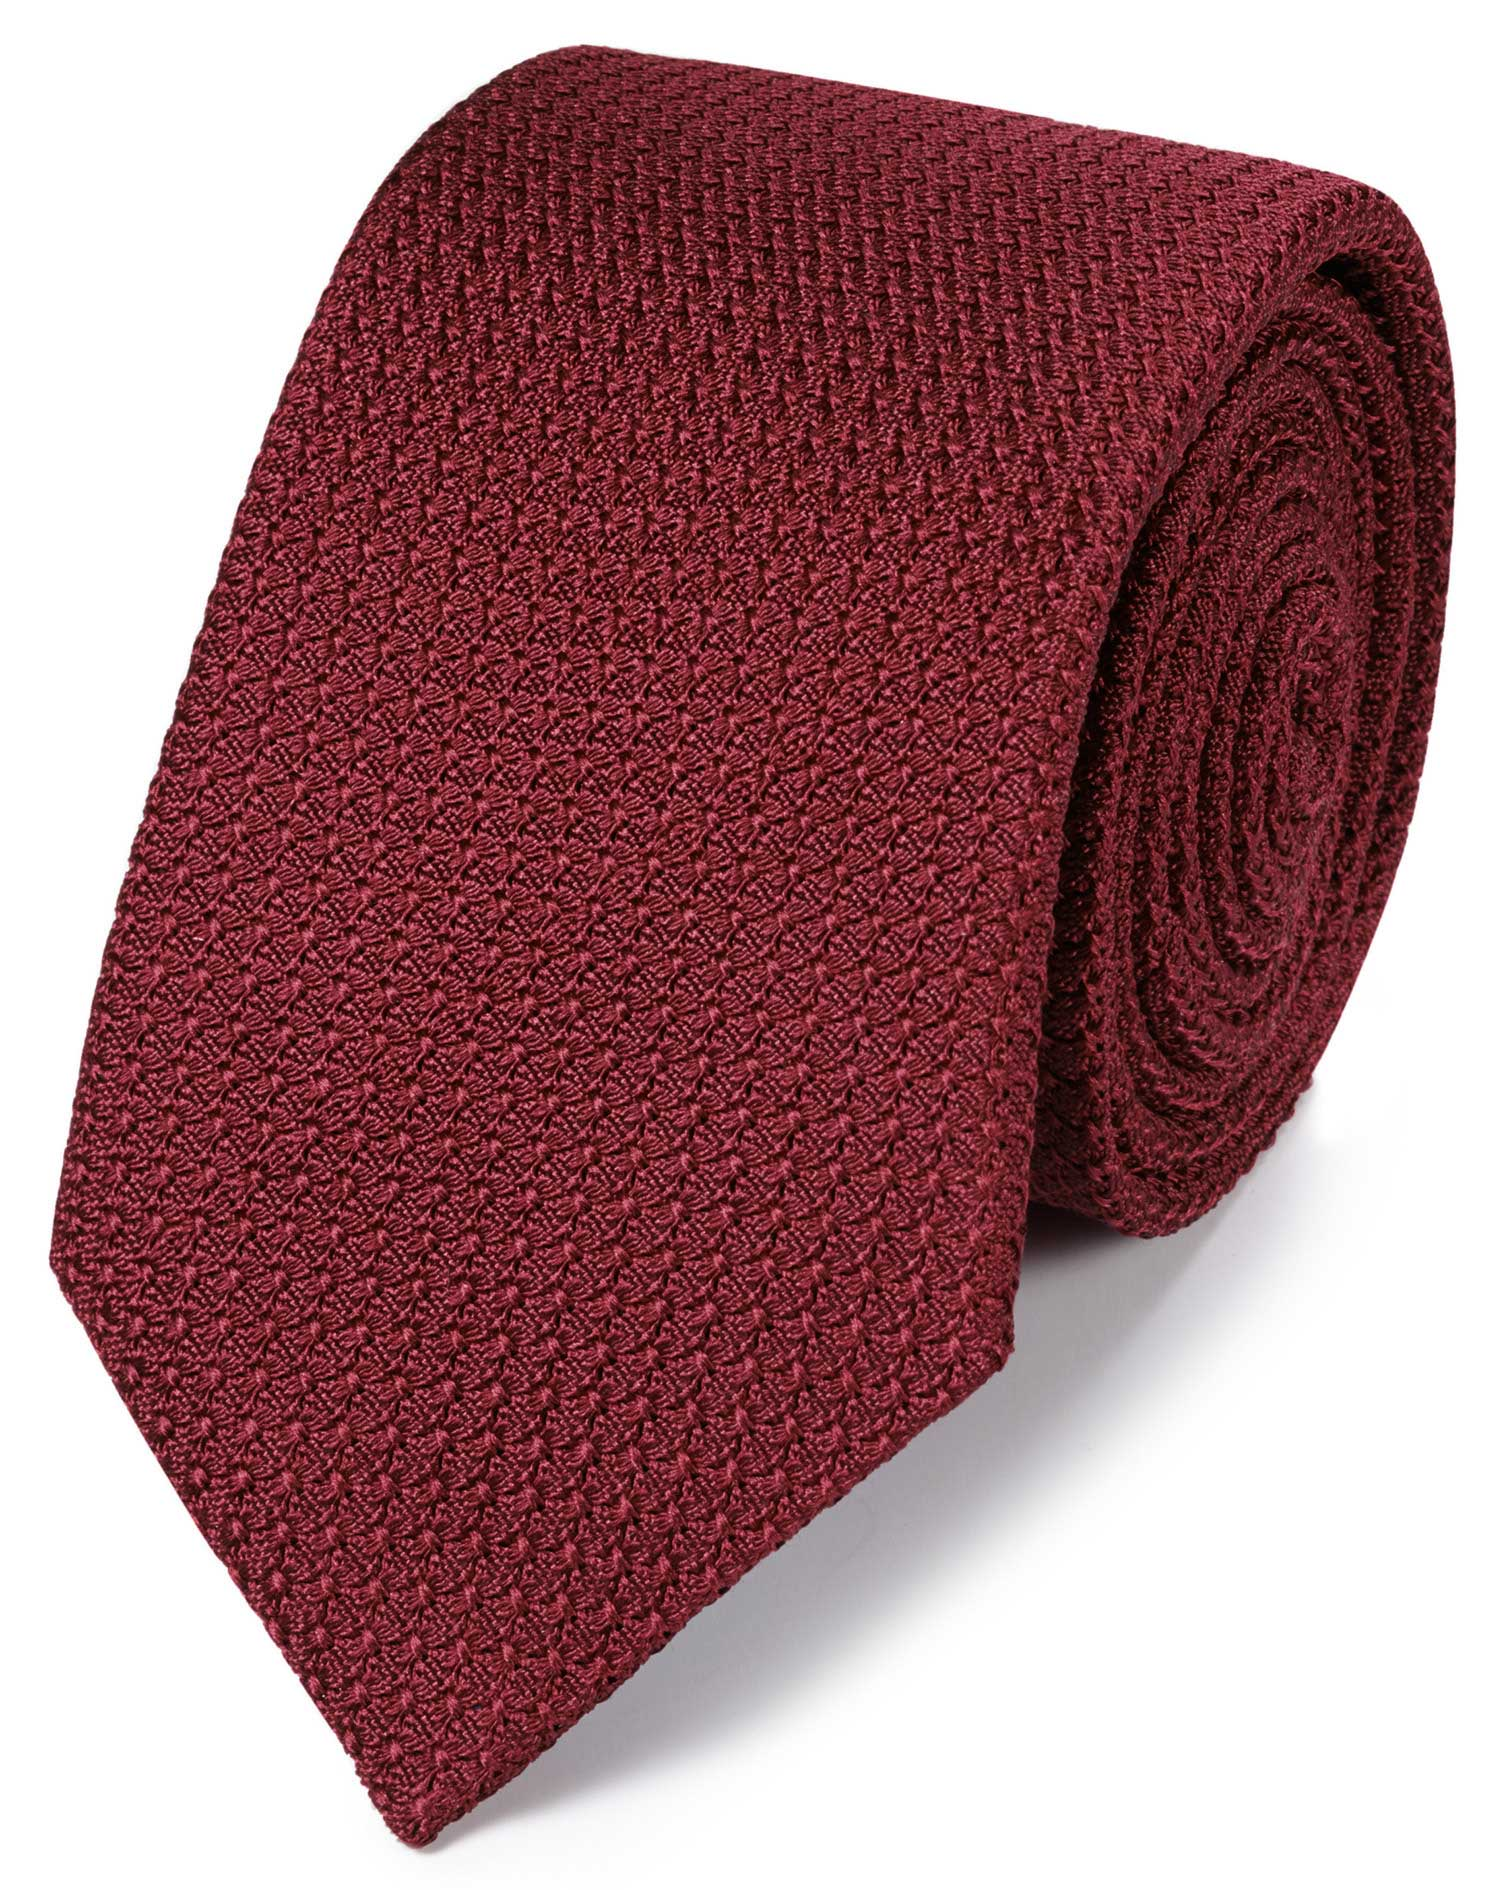 cravate rouge fonc en luxueuse grenadine de soie italienne charles tyrwhitt. Black Bedroom Furniture Sets. Home Design Ideas